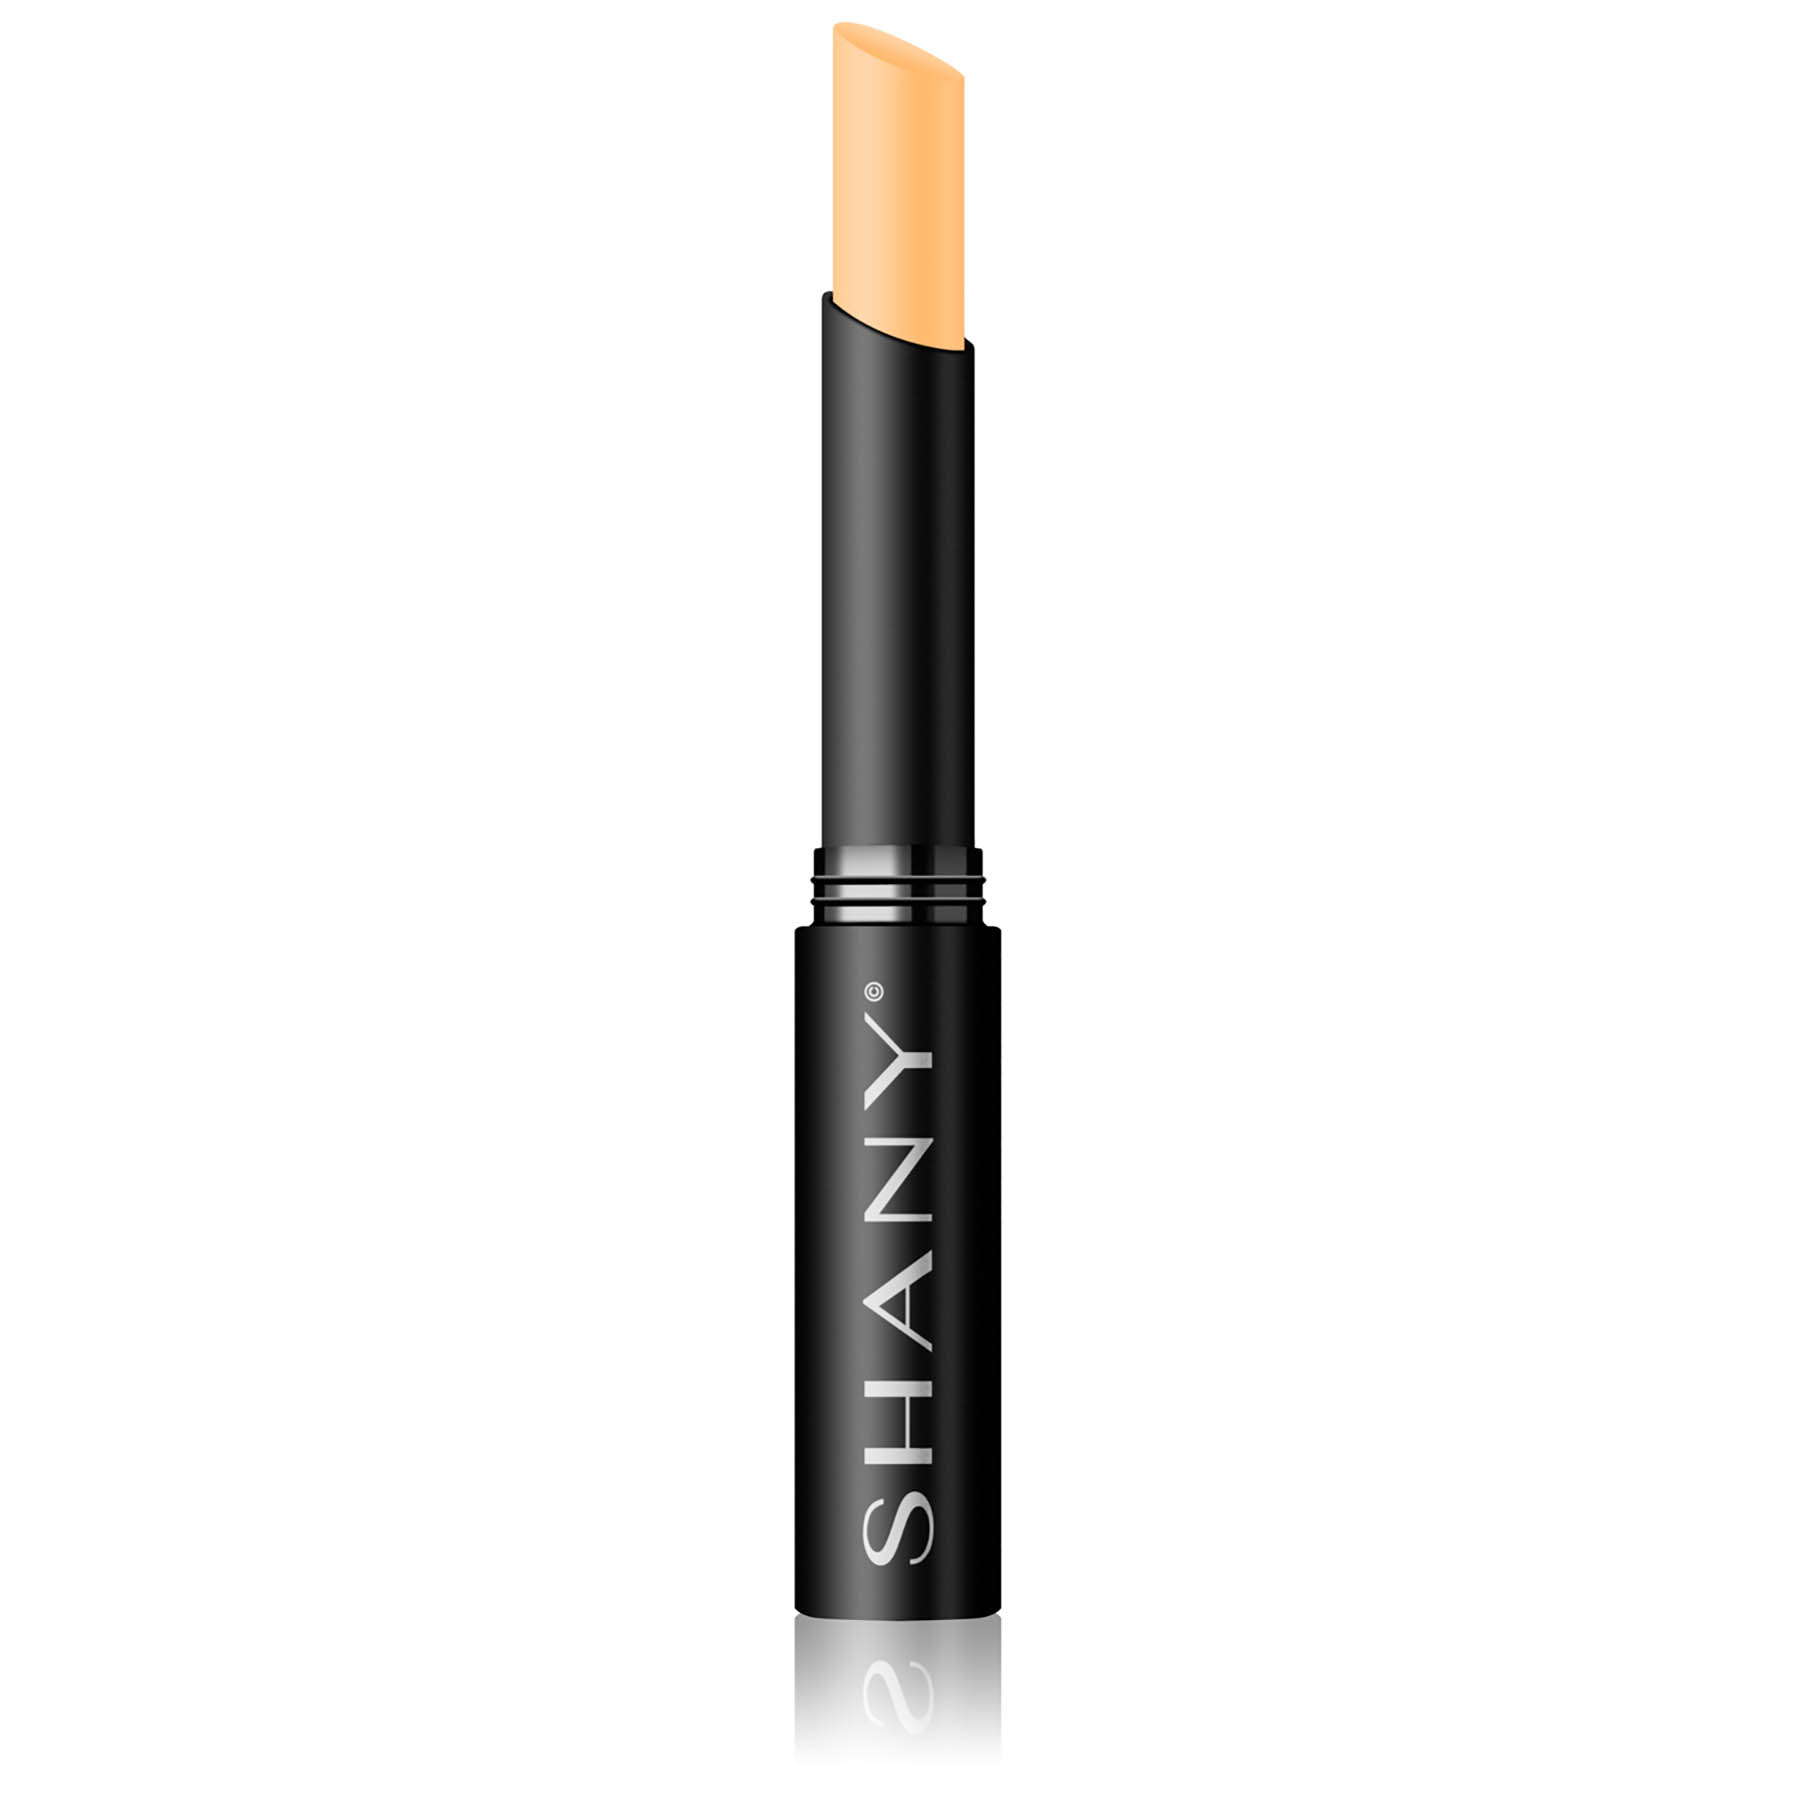 SHANY Crème Concealer Stick - LW2 - Paraben Free/Talc Free